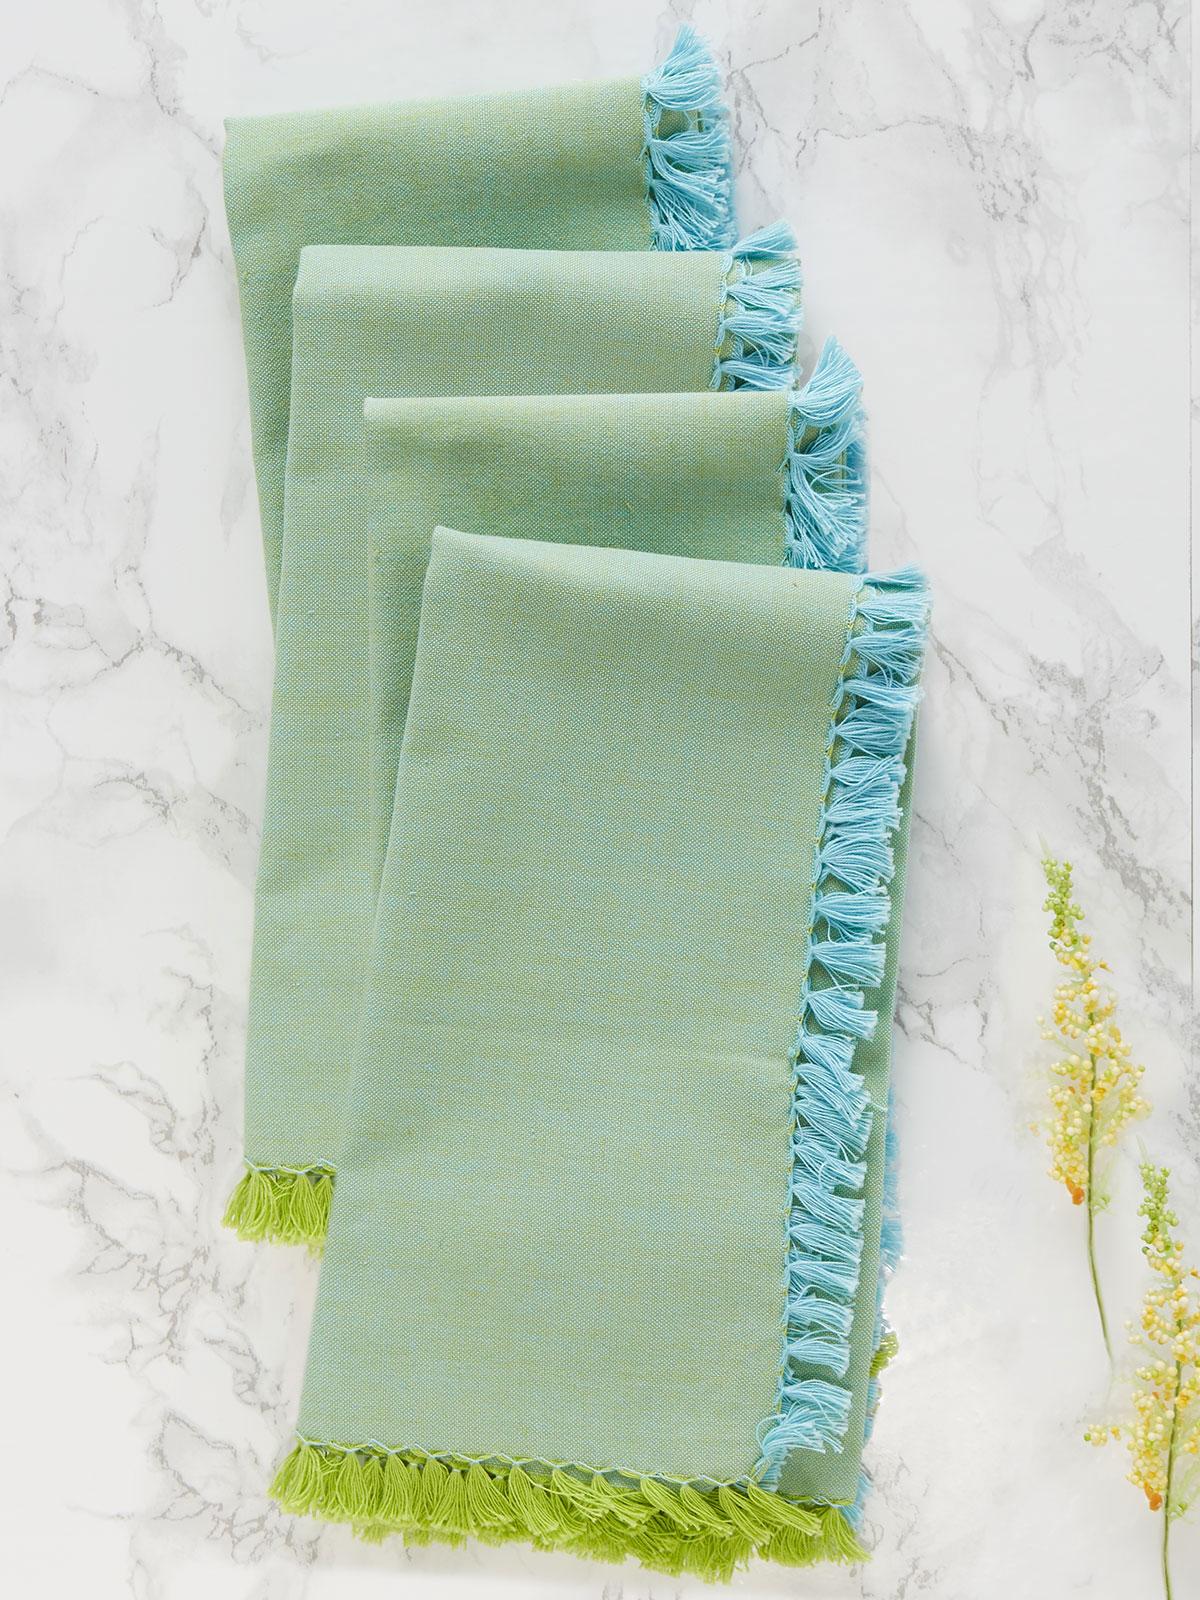 Chambray Napkin Set of 4 - Aqua/Green